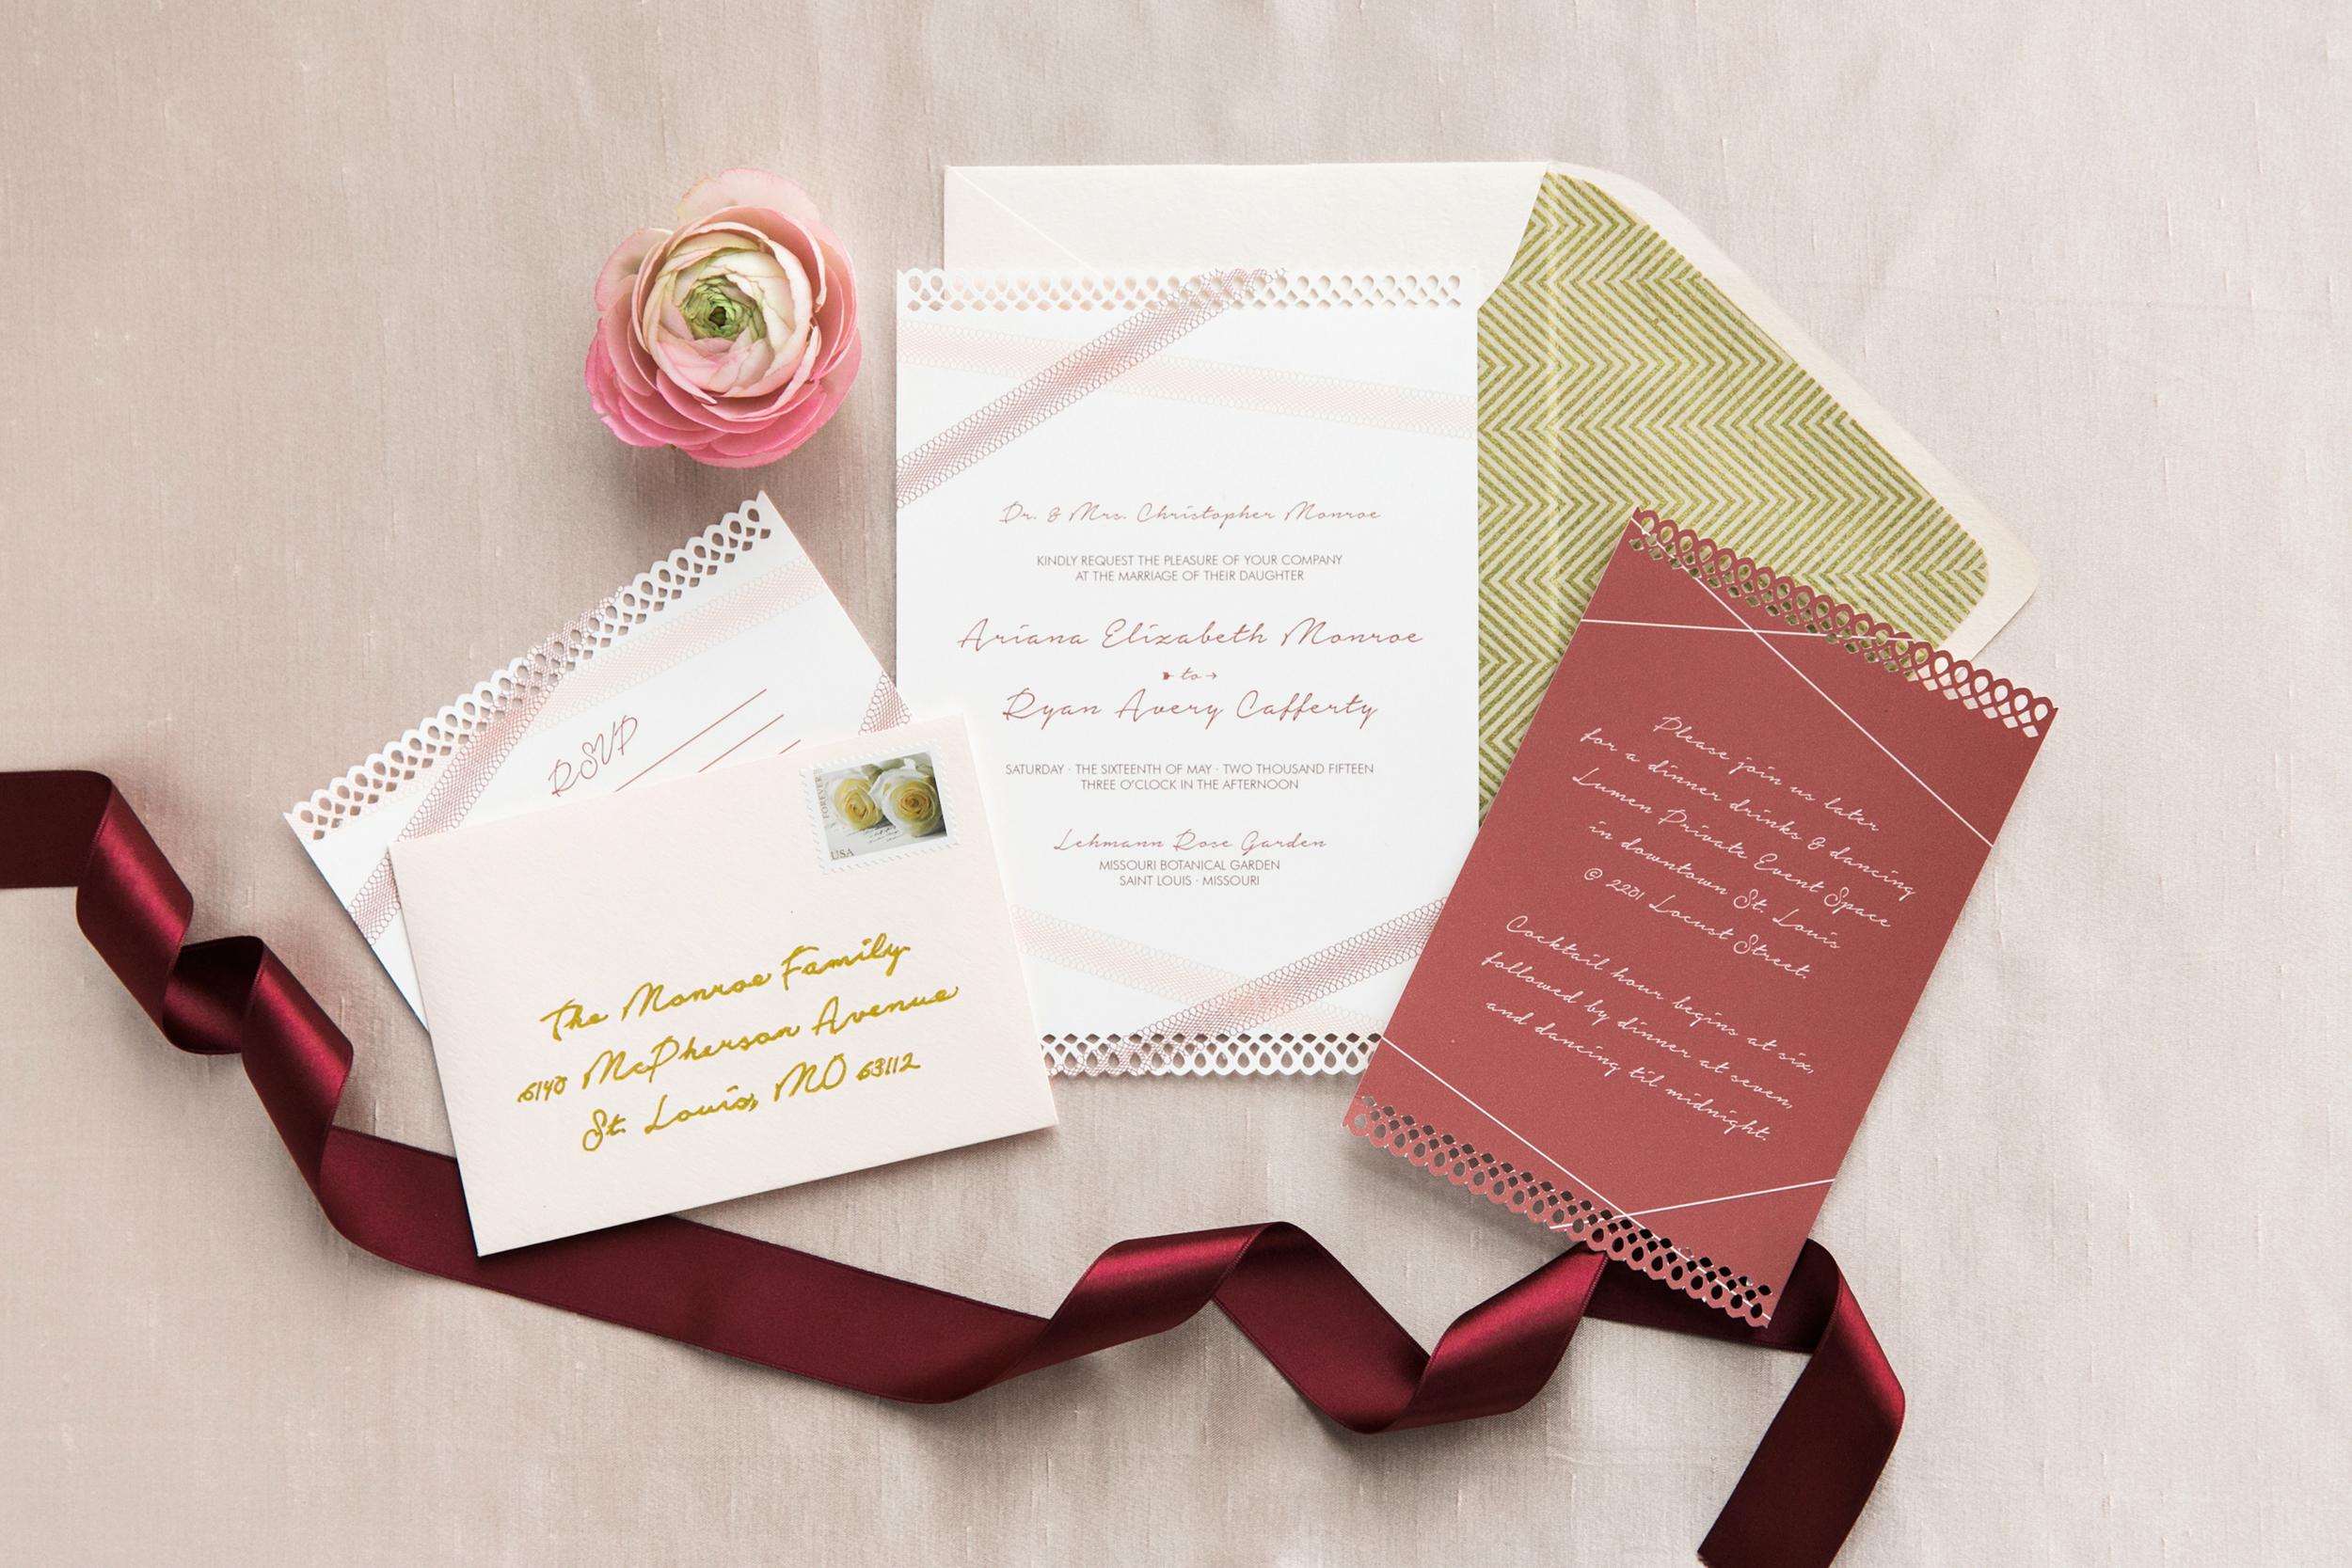 Rosy Laced Marsala Inspiration